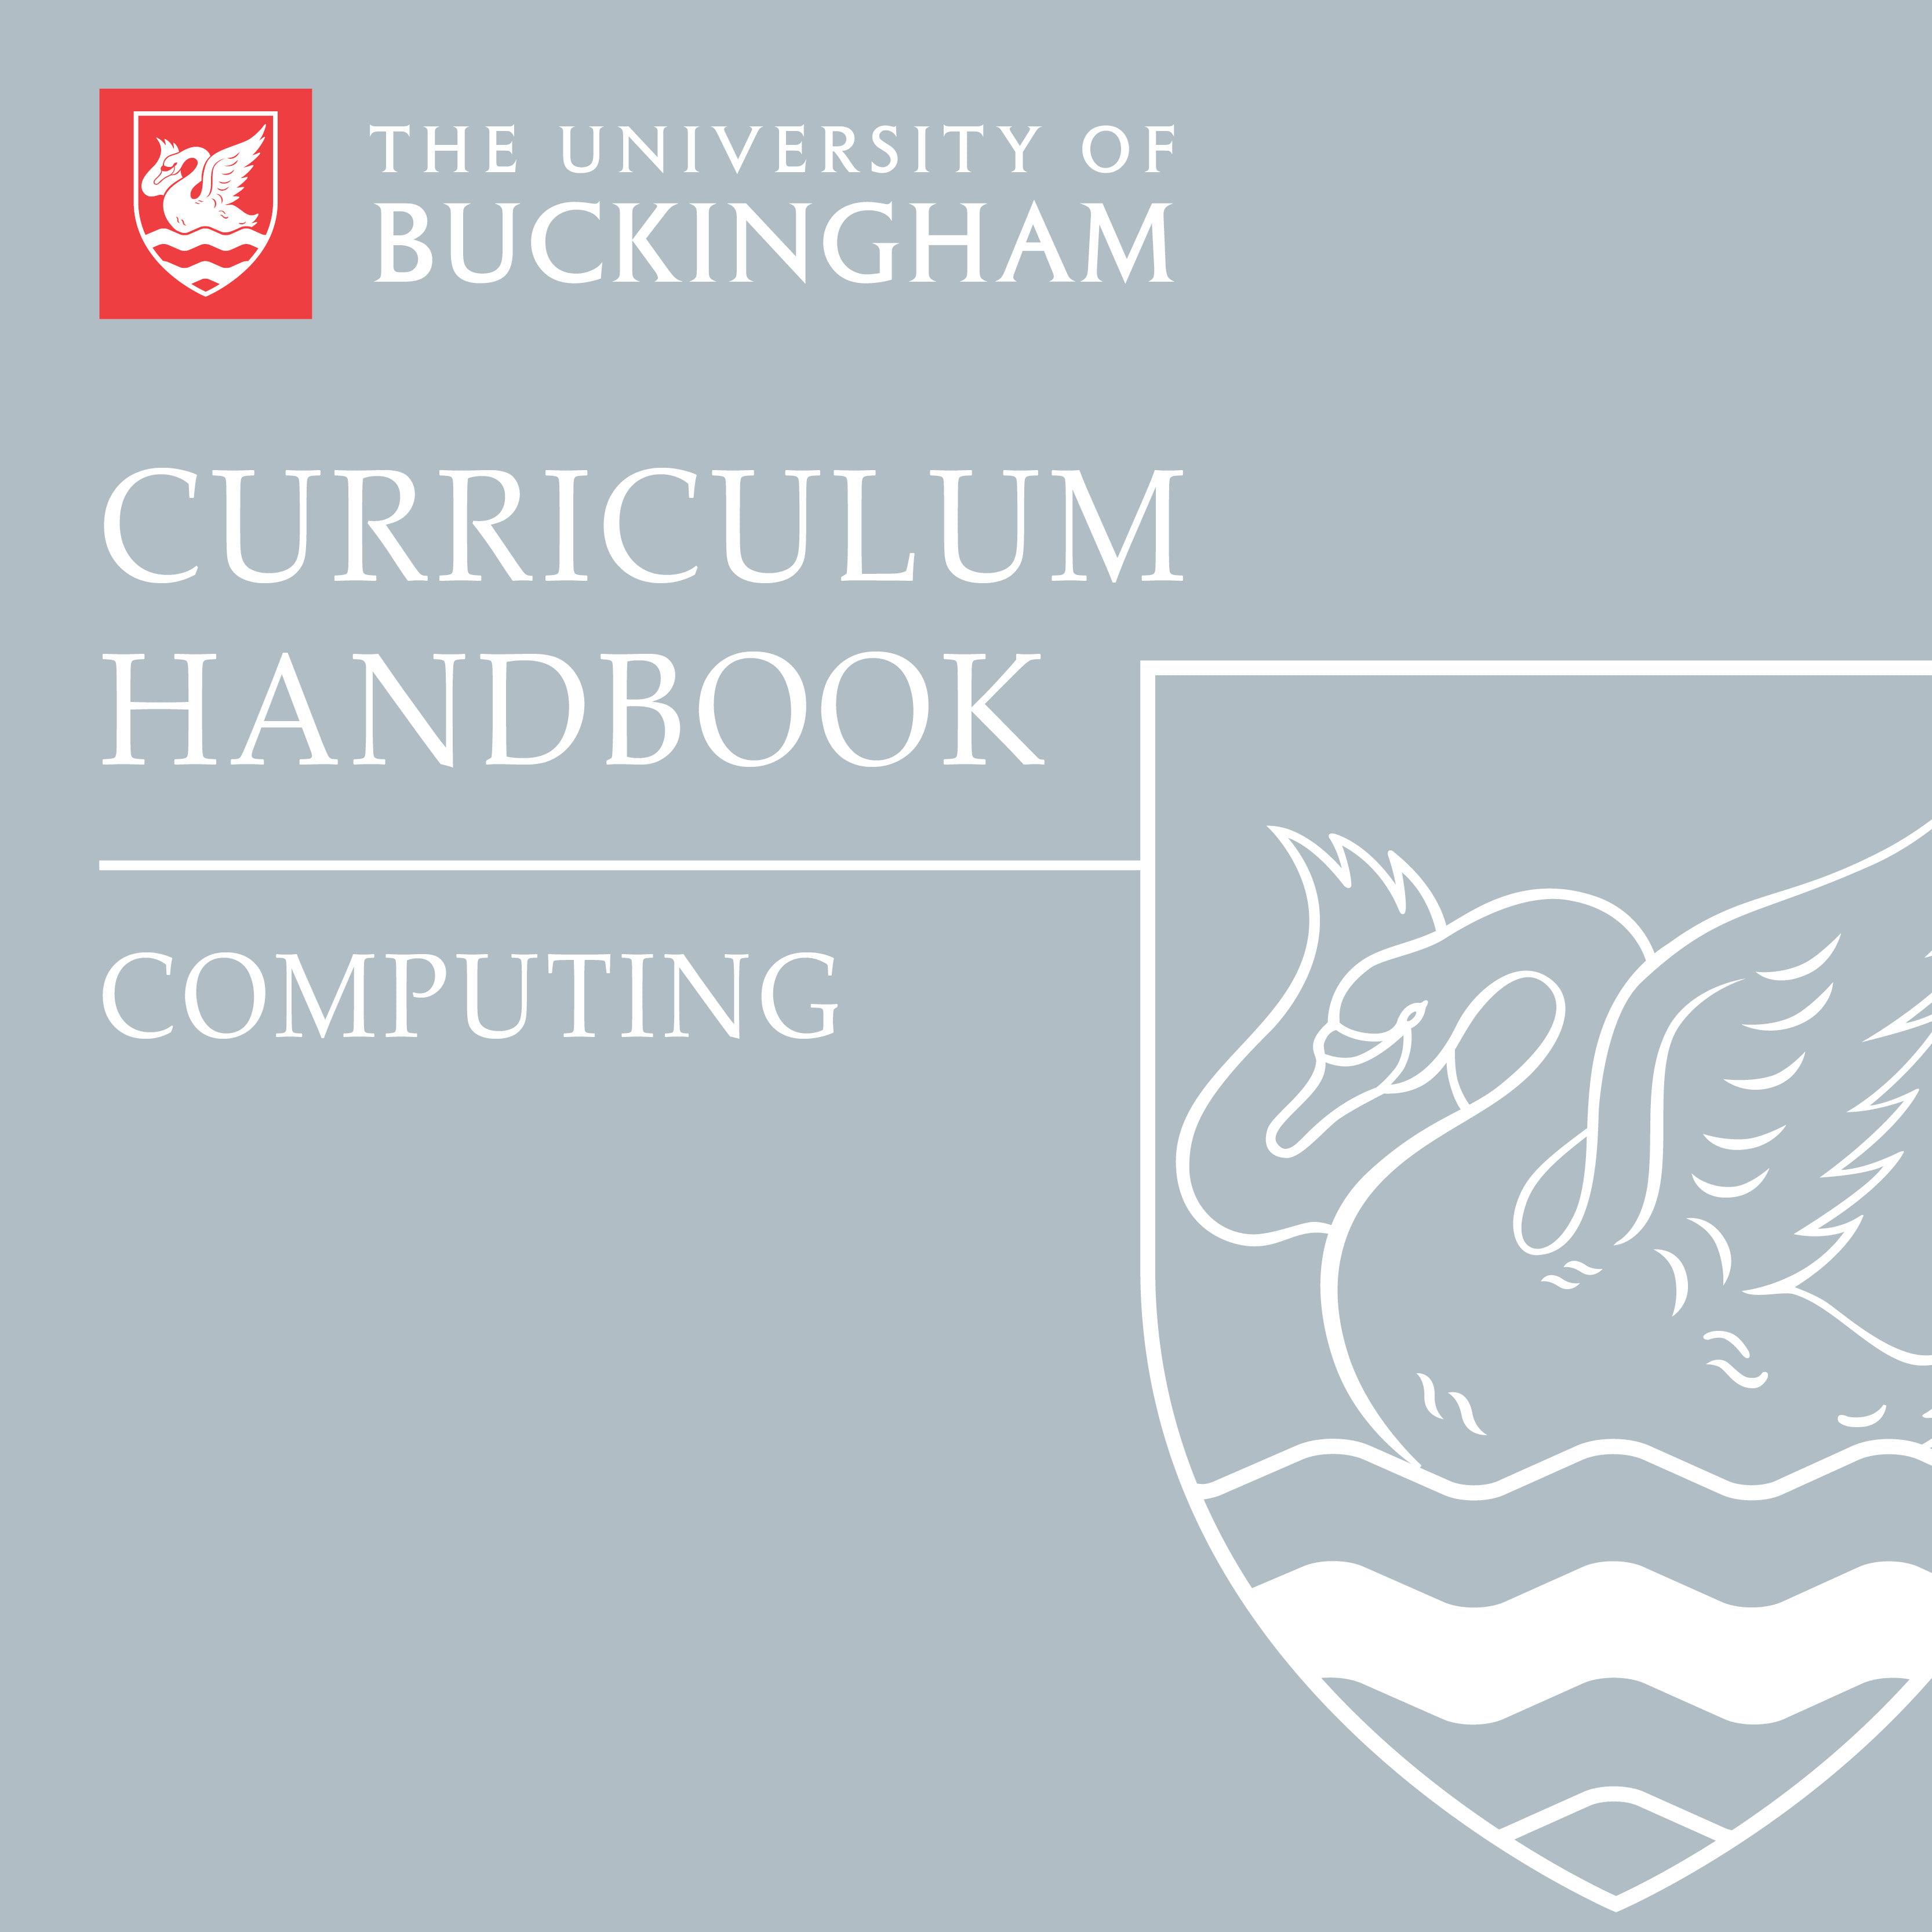 Curriculum Handbook - Computing - front cover - online